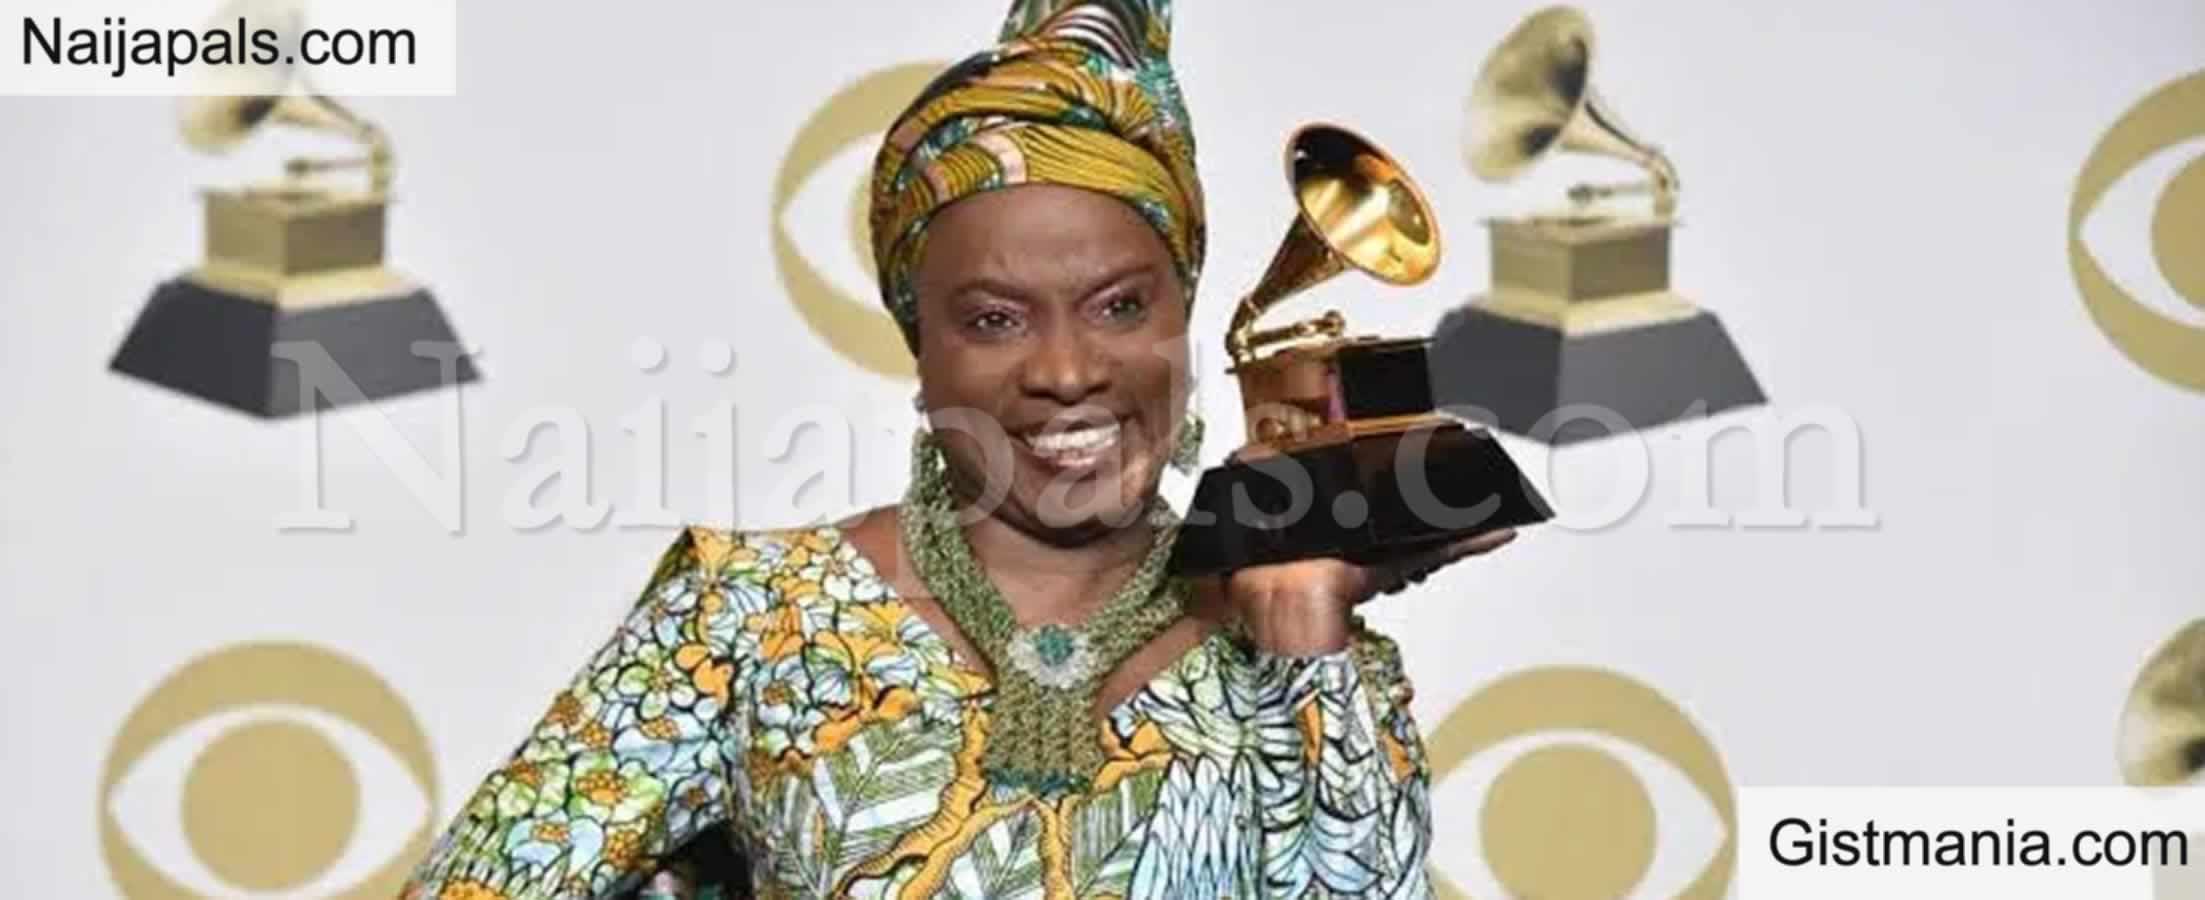 "<img alt='.' class='lazyload' data-src='https://img.gistmania.com/emot/cry.gif' /><b> ""I Feared For Nigeria During #EndSARS Protest"" - Grammy Award Winner, Angelique Kidjo Laments</b>"